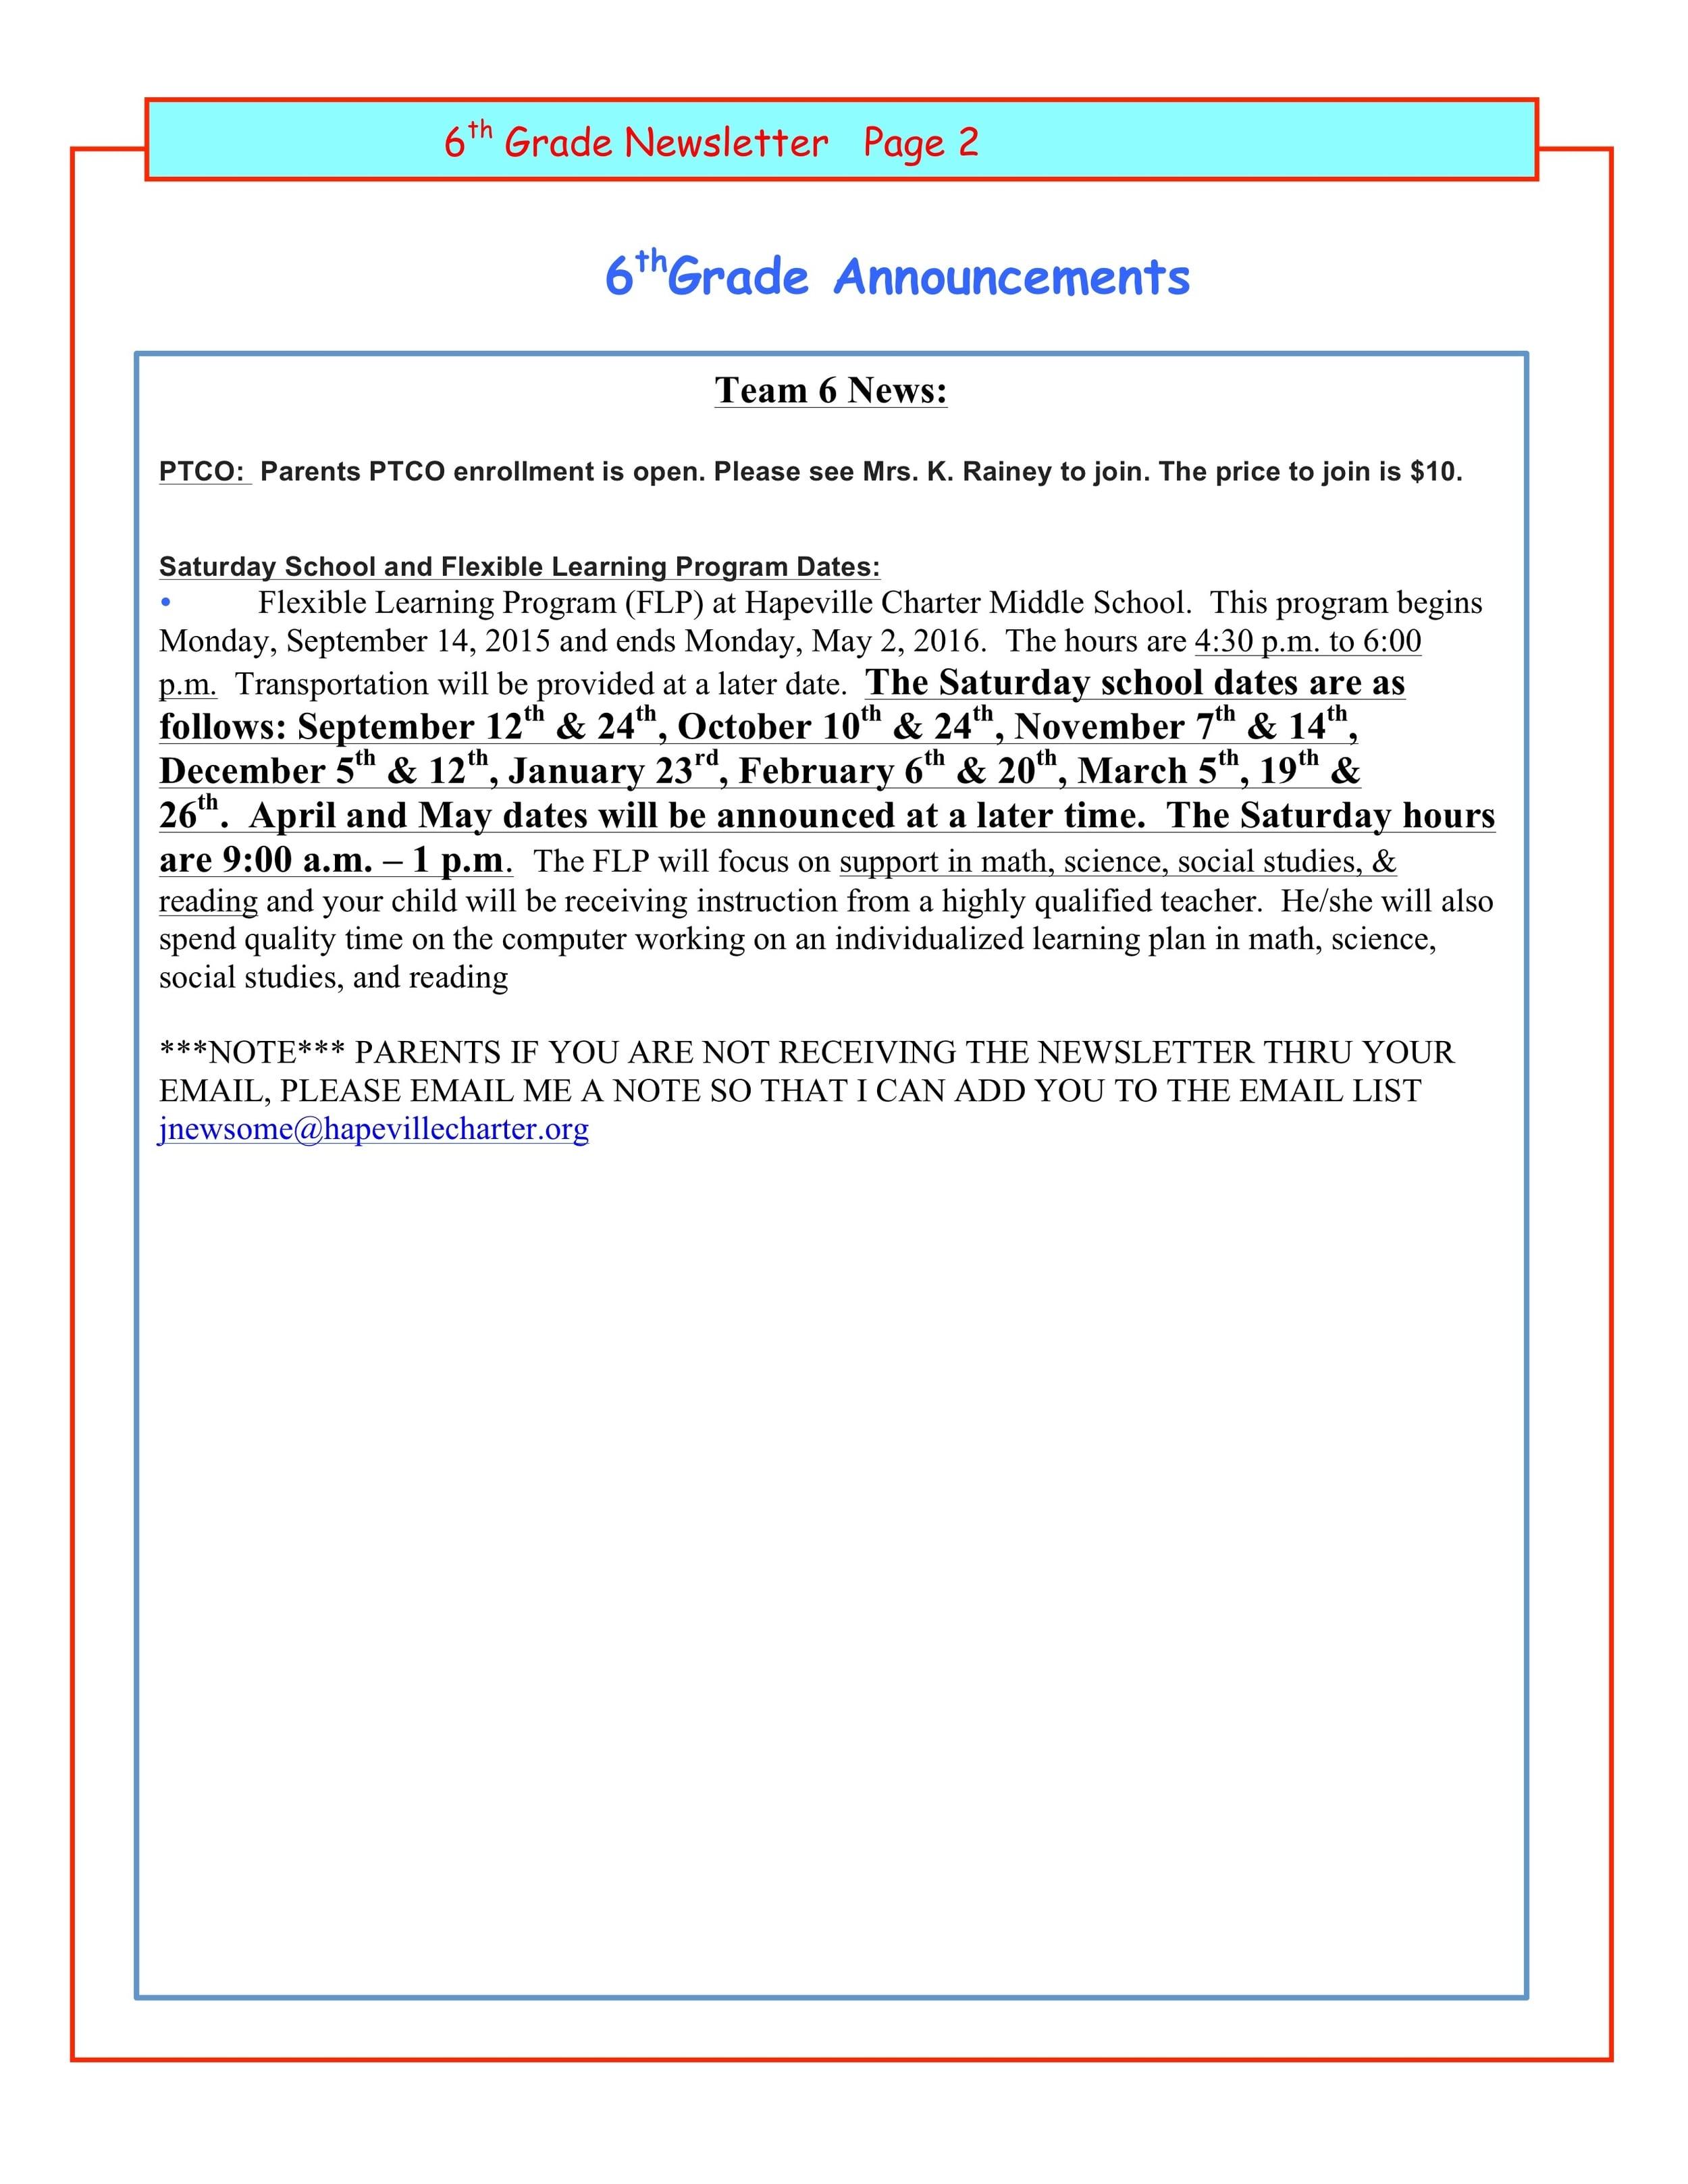 Newsletter Image6th grade 1-11 2.jpeg